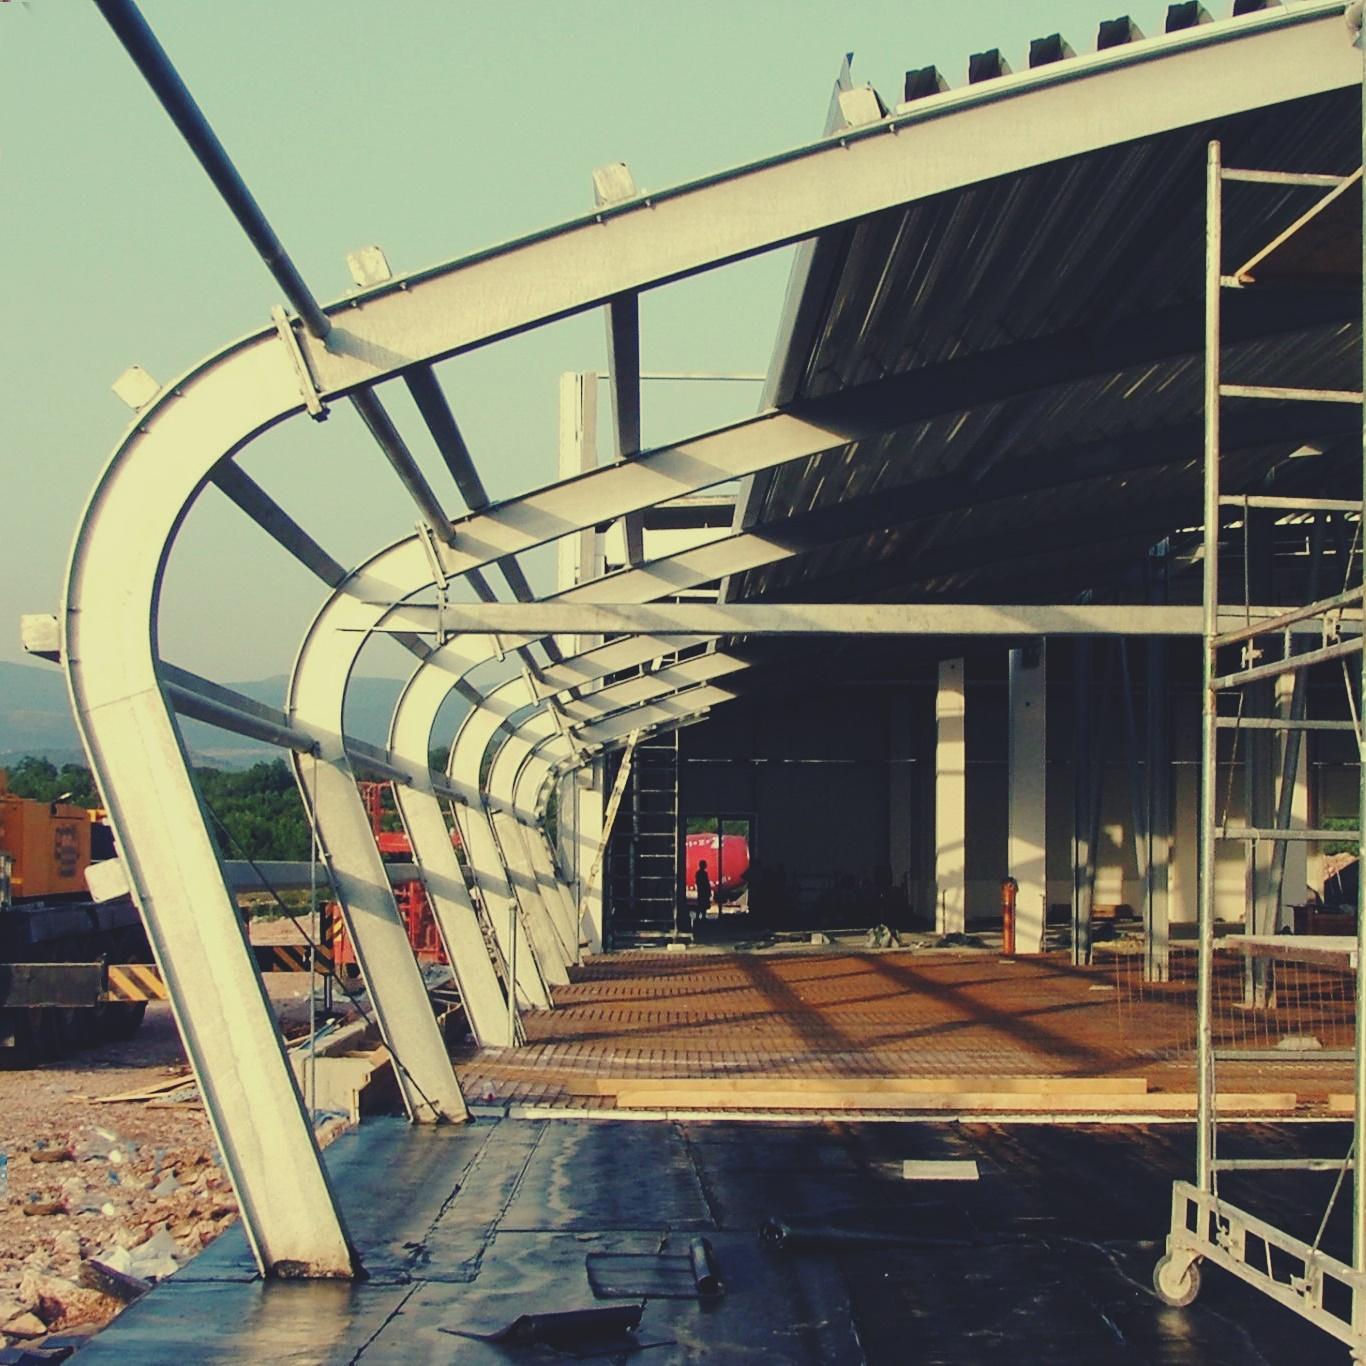 pevec rijeka, pevec, rijeka, hrvatska, croatia, upi-2m, upi2m, čelik, steel, structure, konstrukcija, pevec zagreb d.o.o.